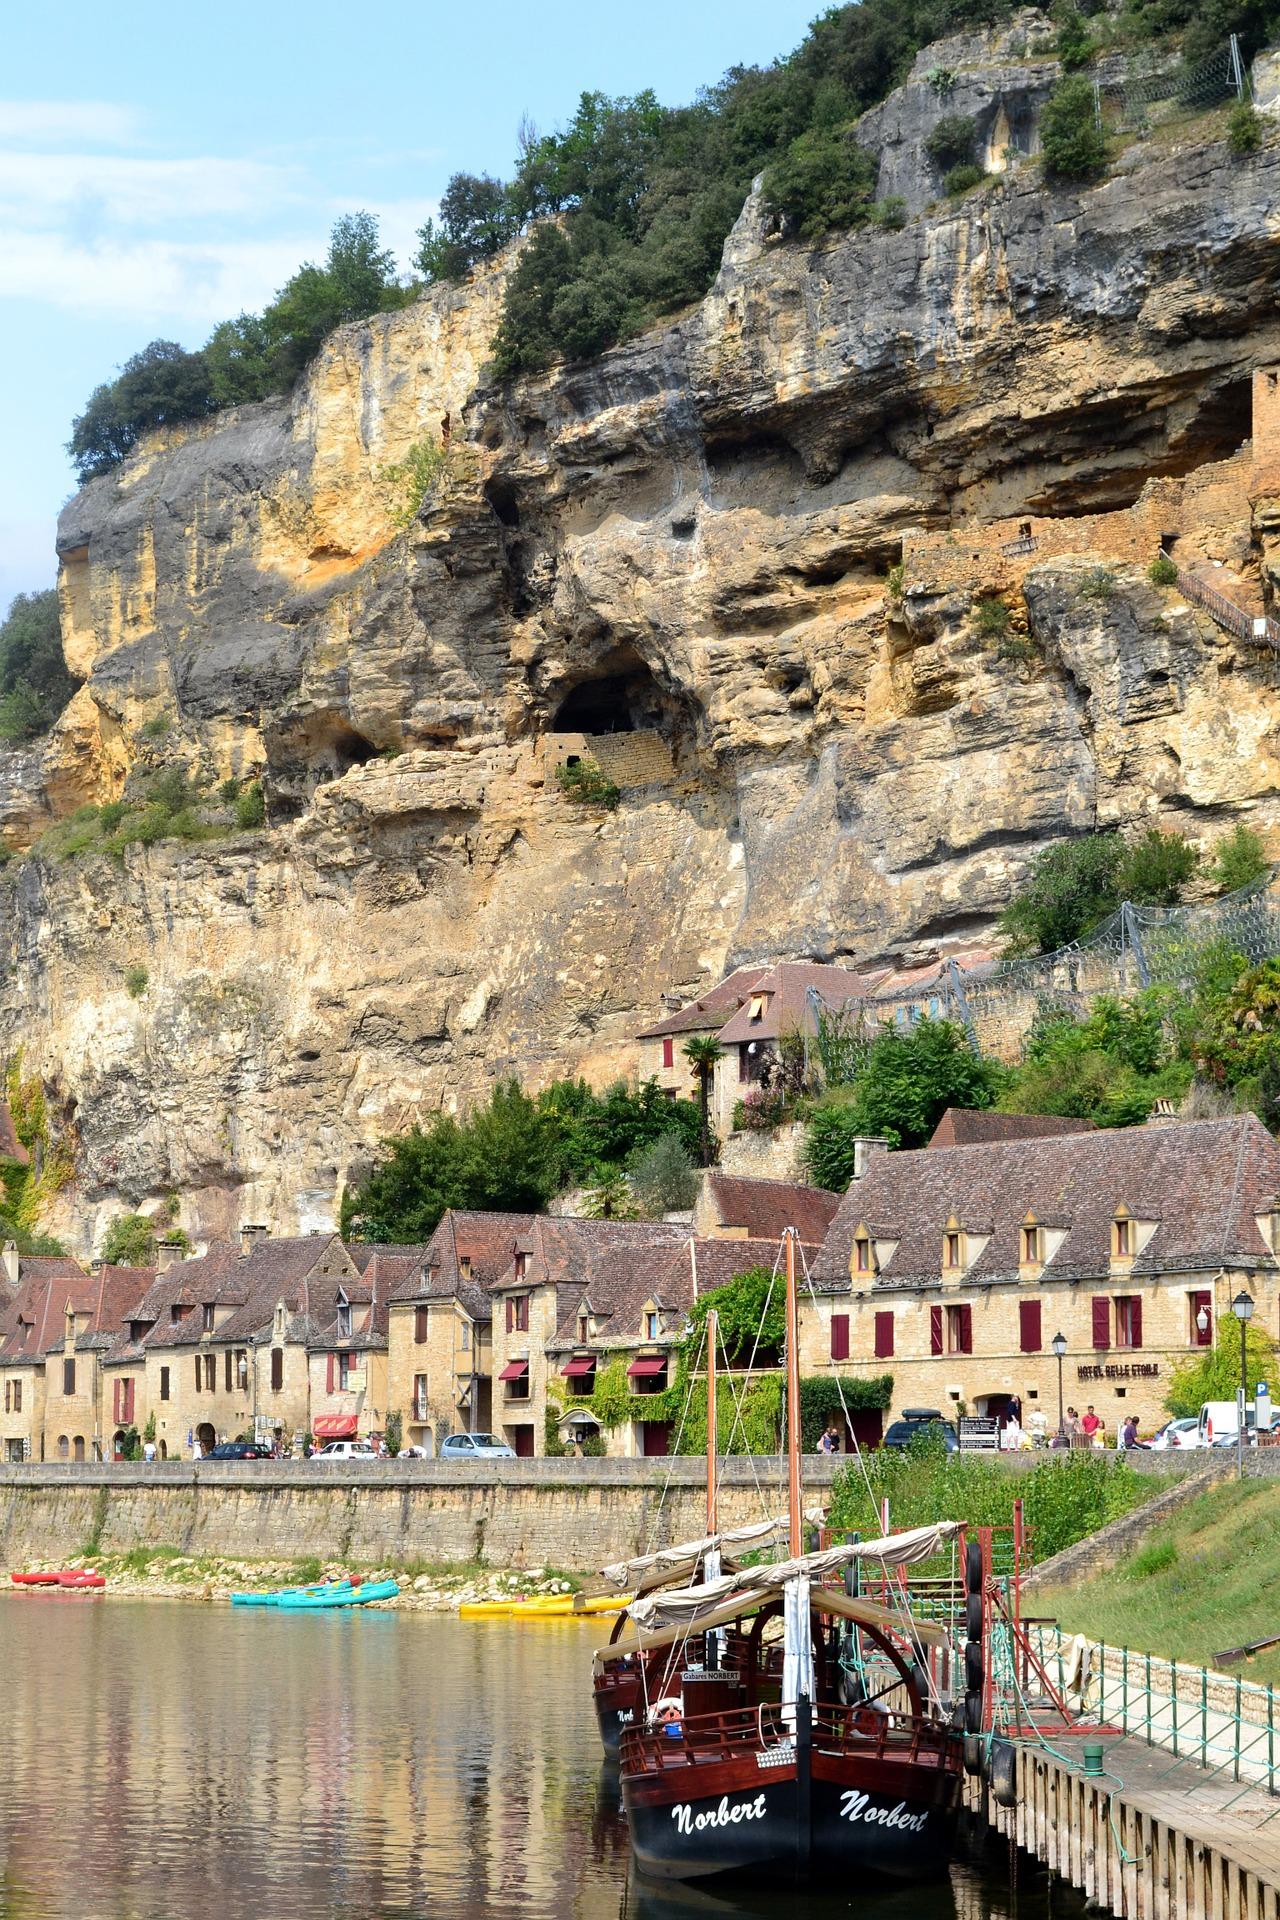 les aires de camping car en Dordogne